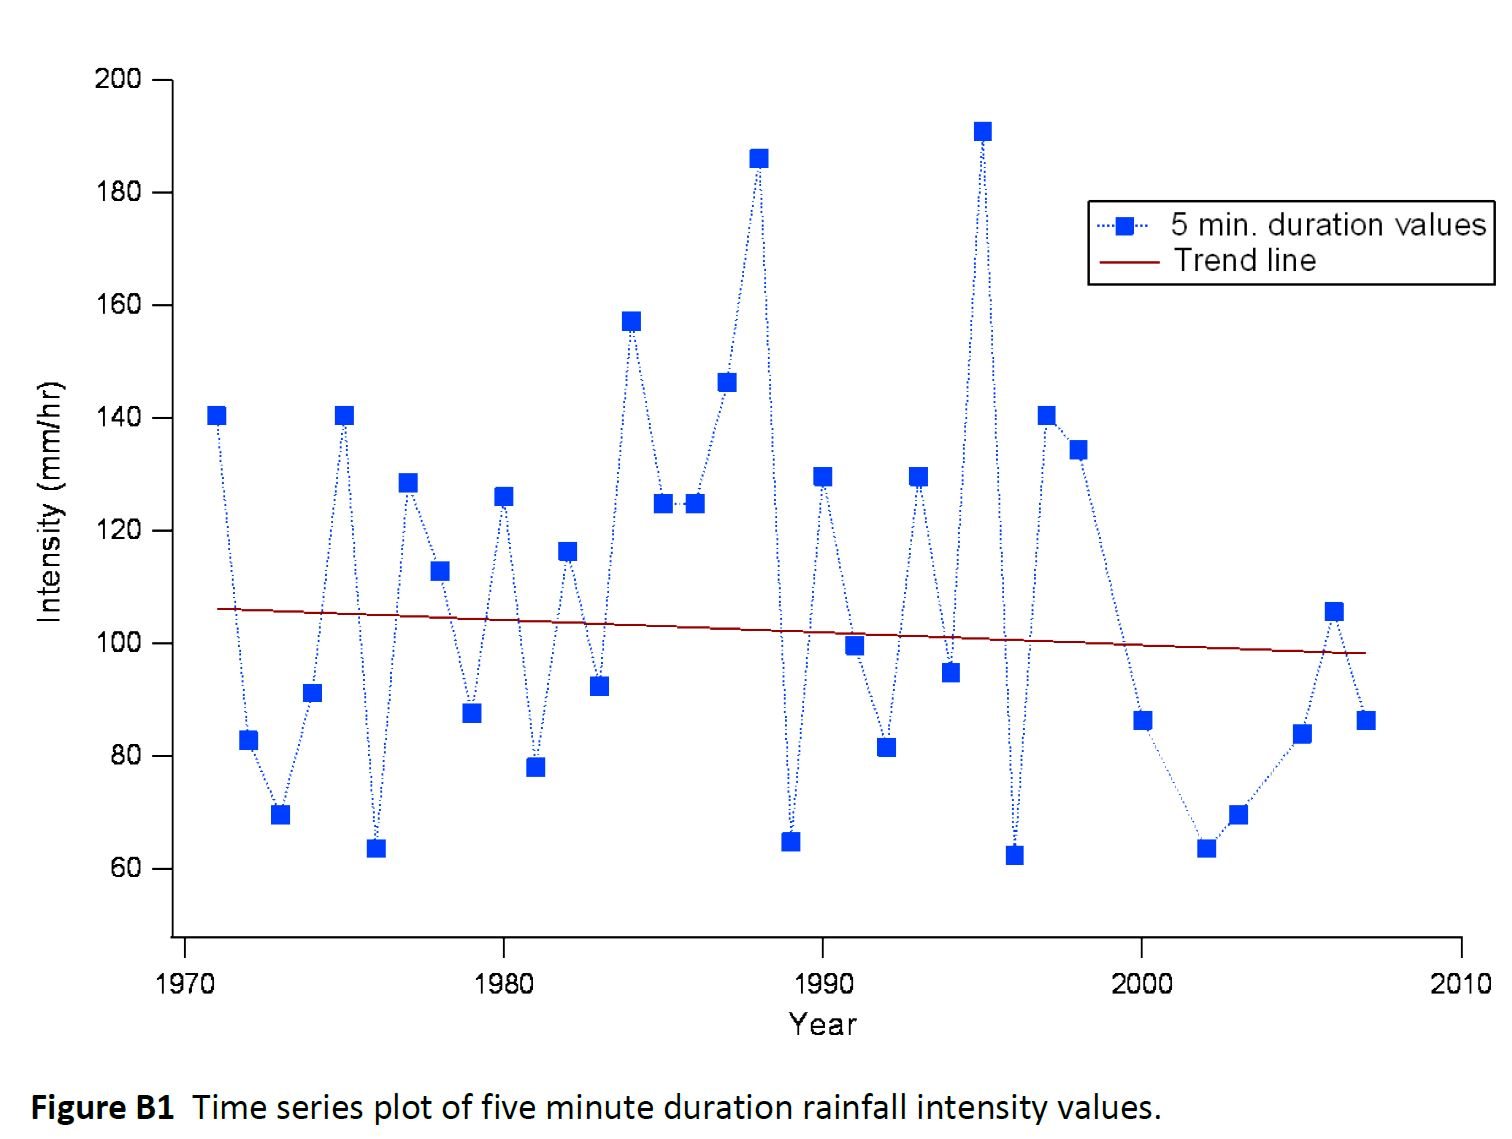 CityFloodMap.Com: Less Extreme Short Duration Rainfall in Kitchener ...